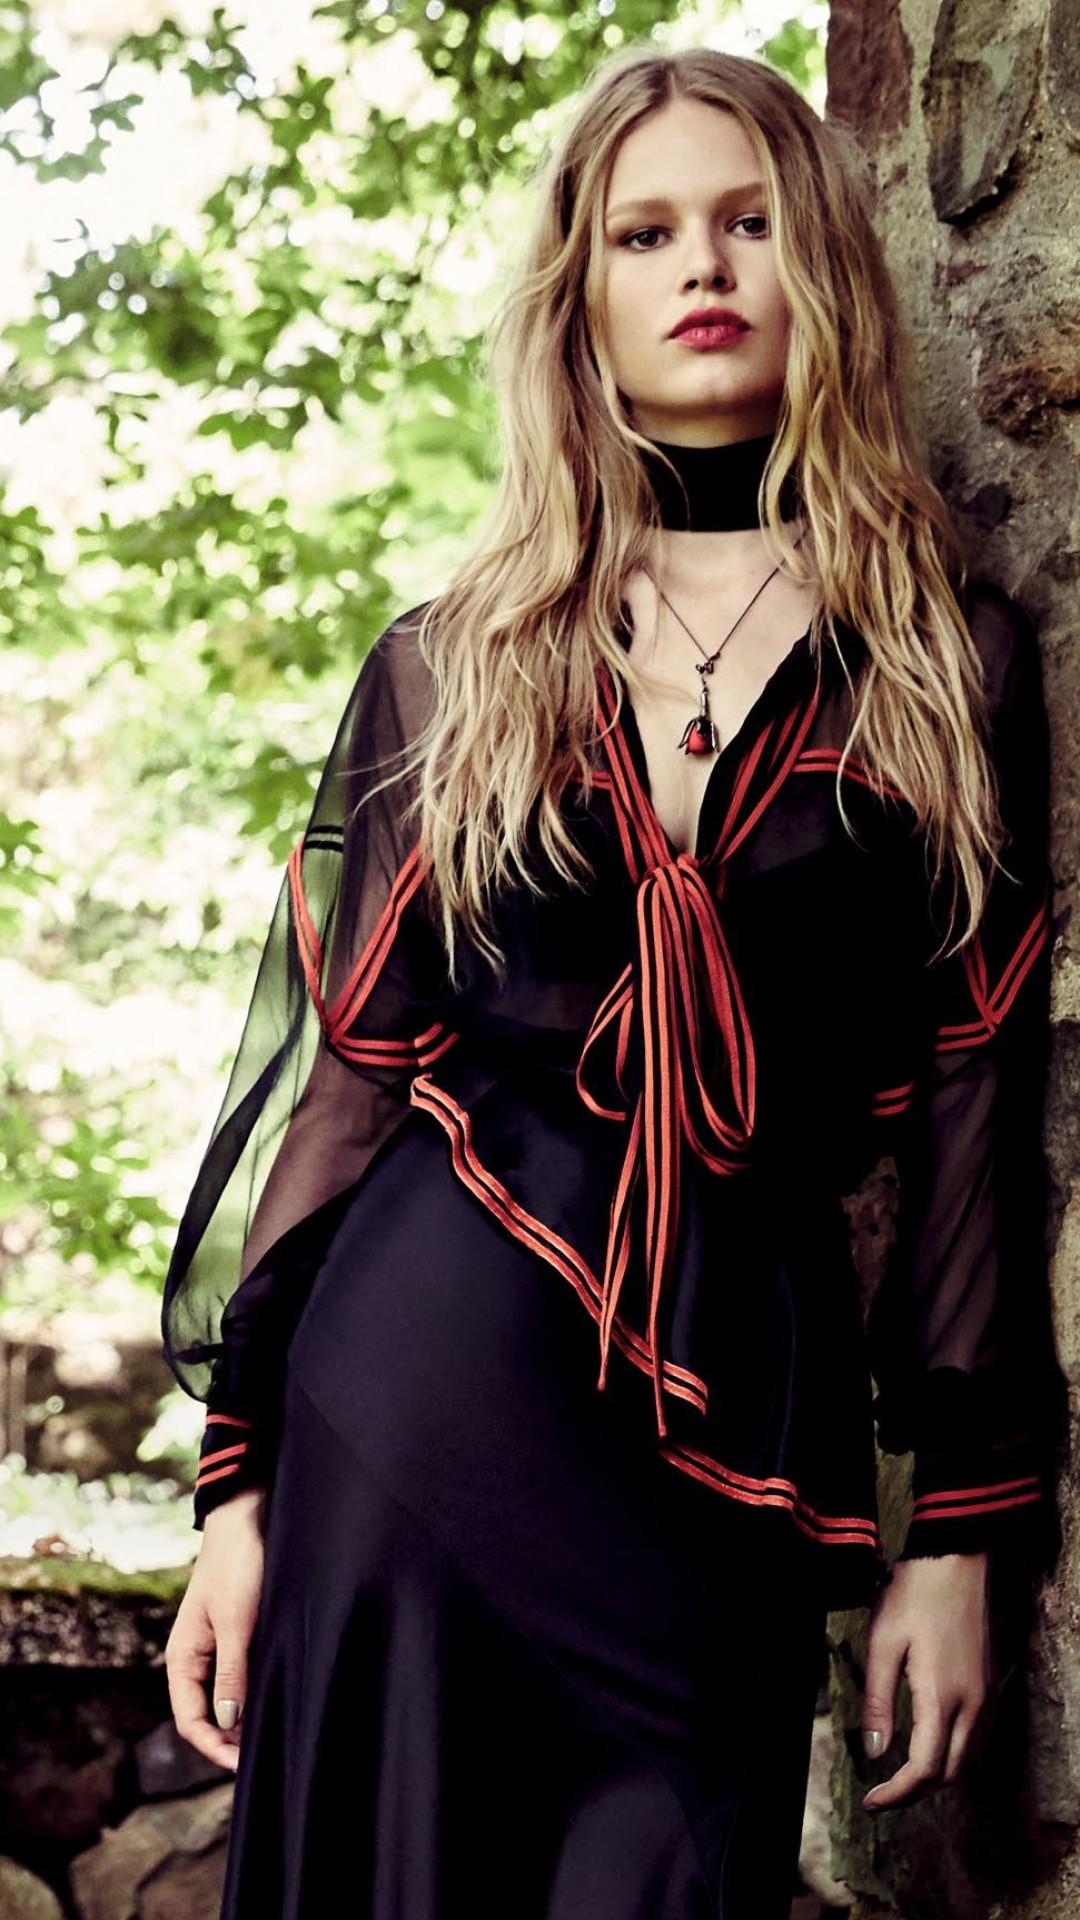 Ania Bielska wallpaper anna ewers, top fashion models, model, celebrities